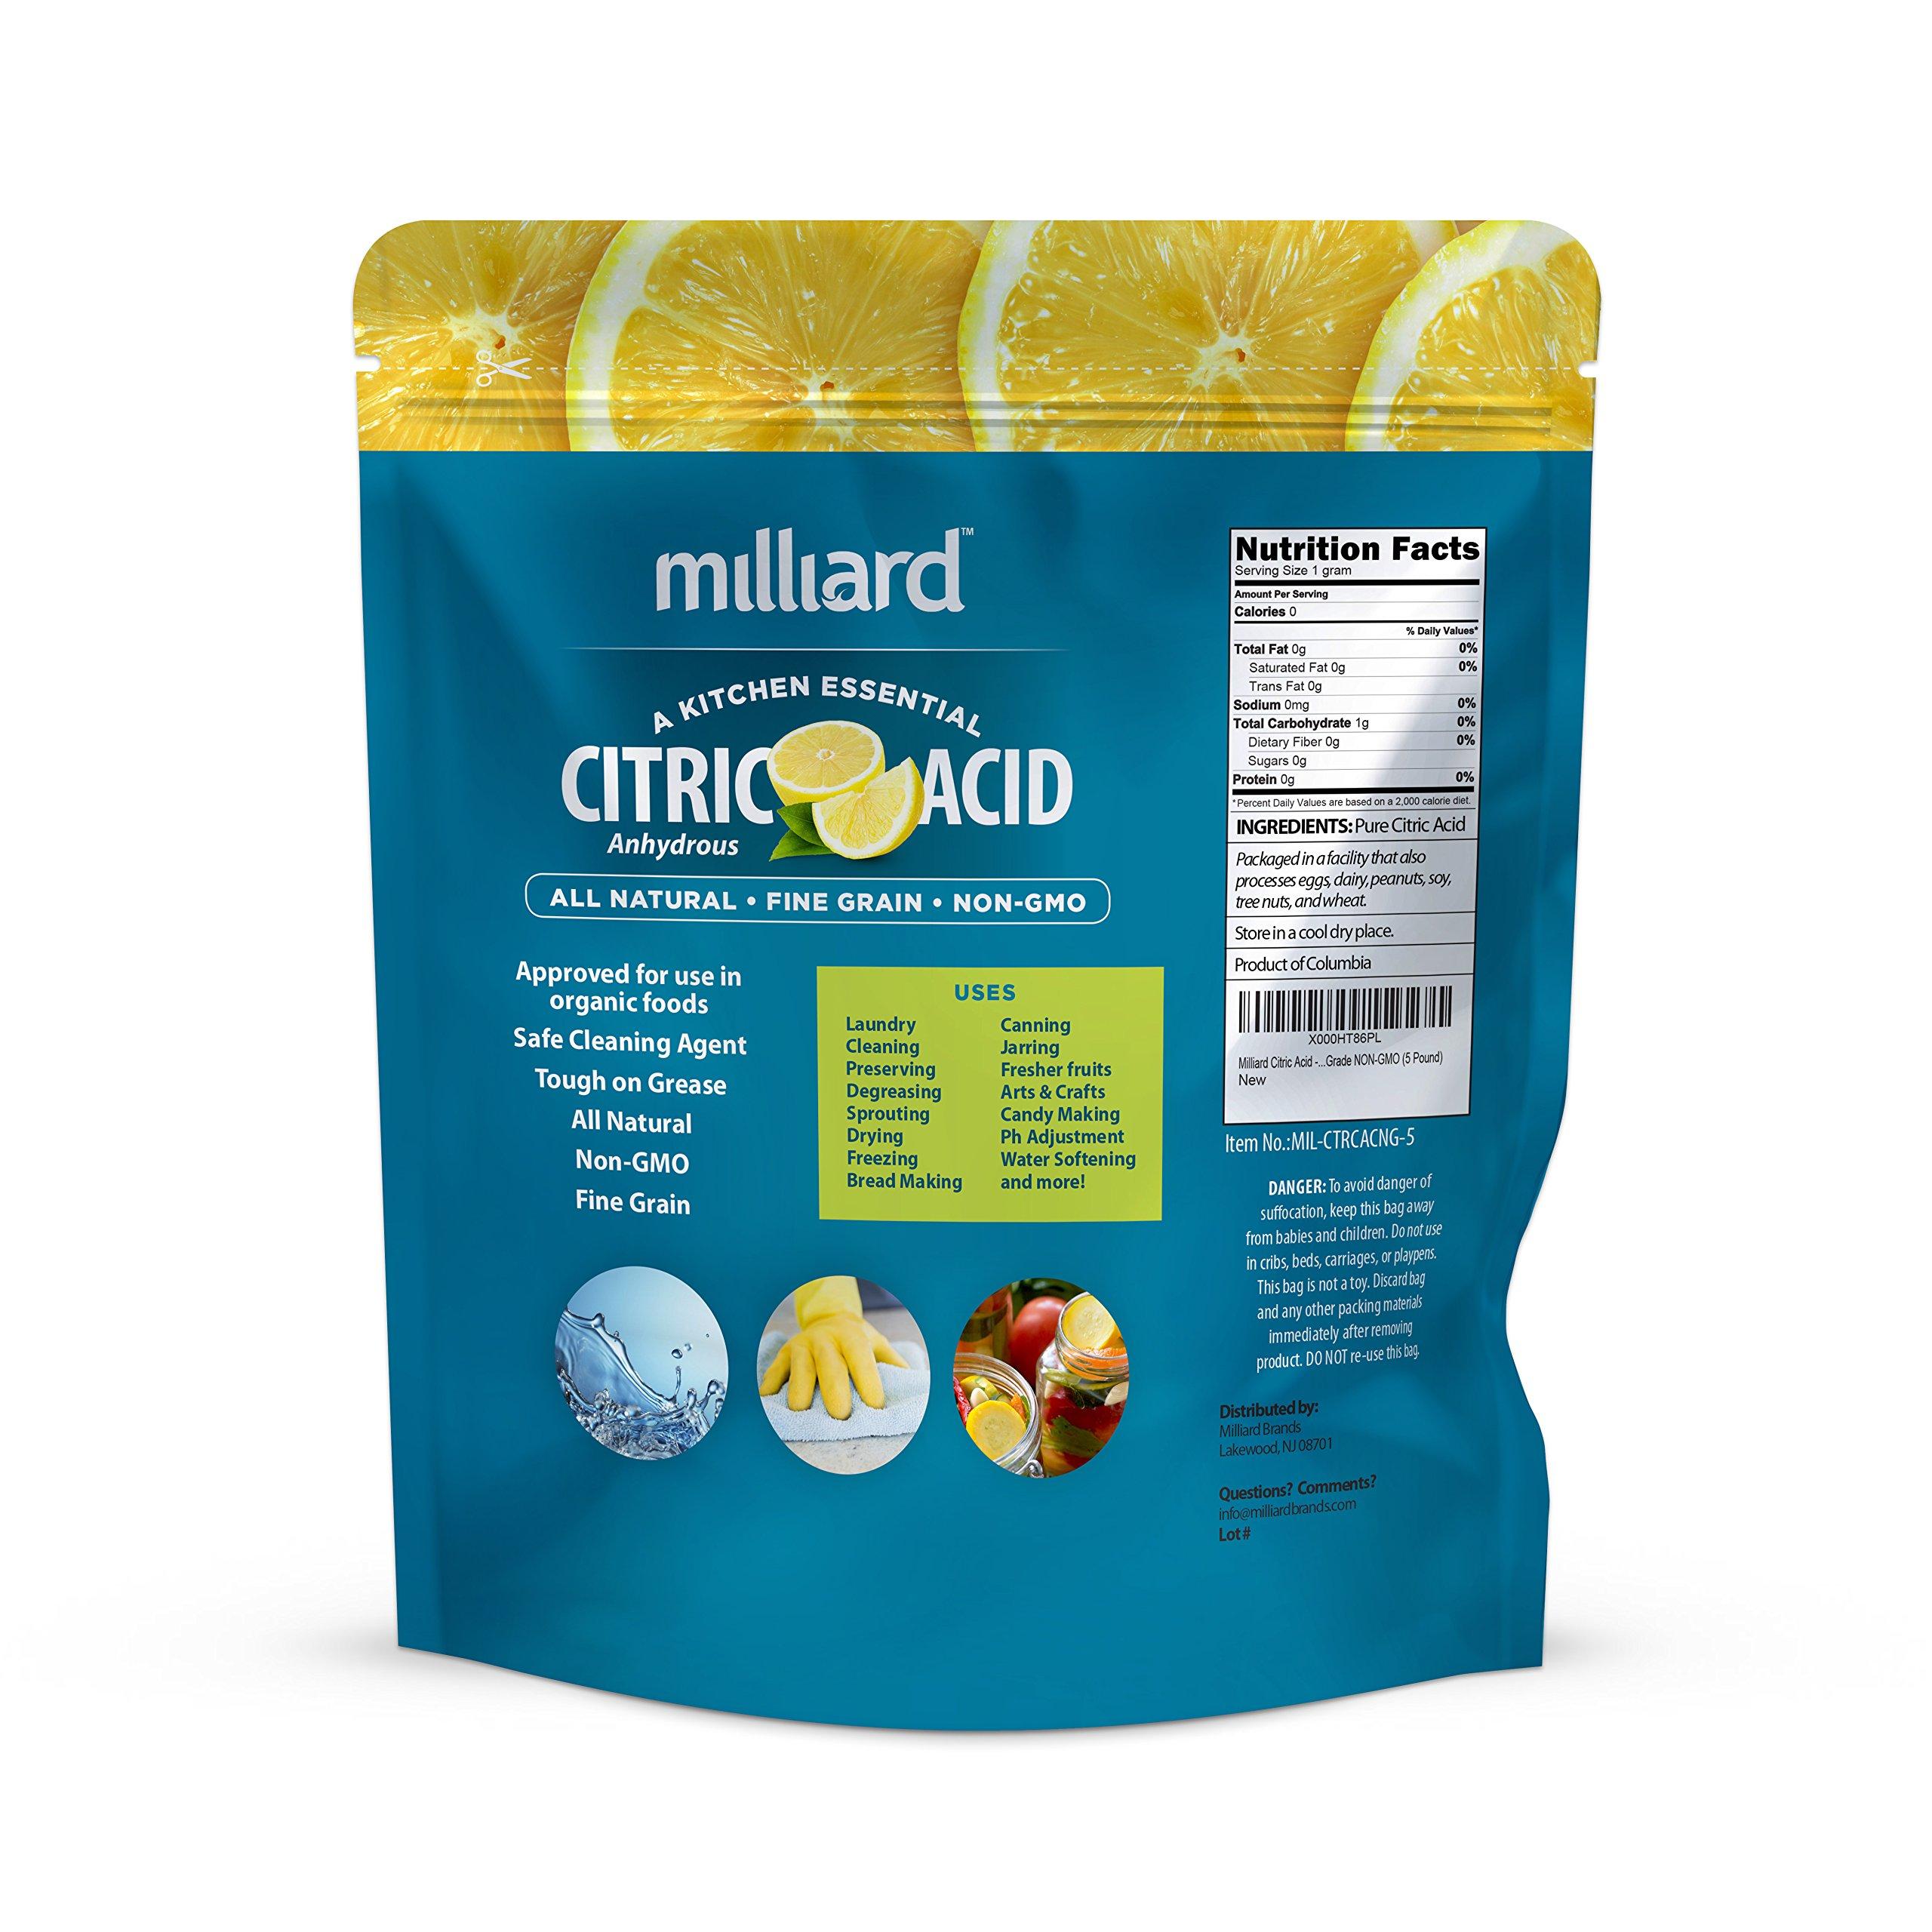 Milliard Citric Acid 5 Pound - 100% Pure Food Grade NON-GMO Project VERIFIED (5 Pound) by Milliard (Image #2)